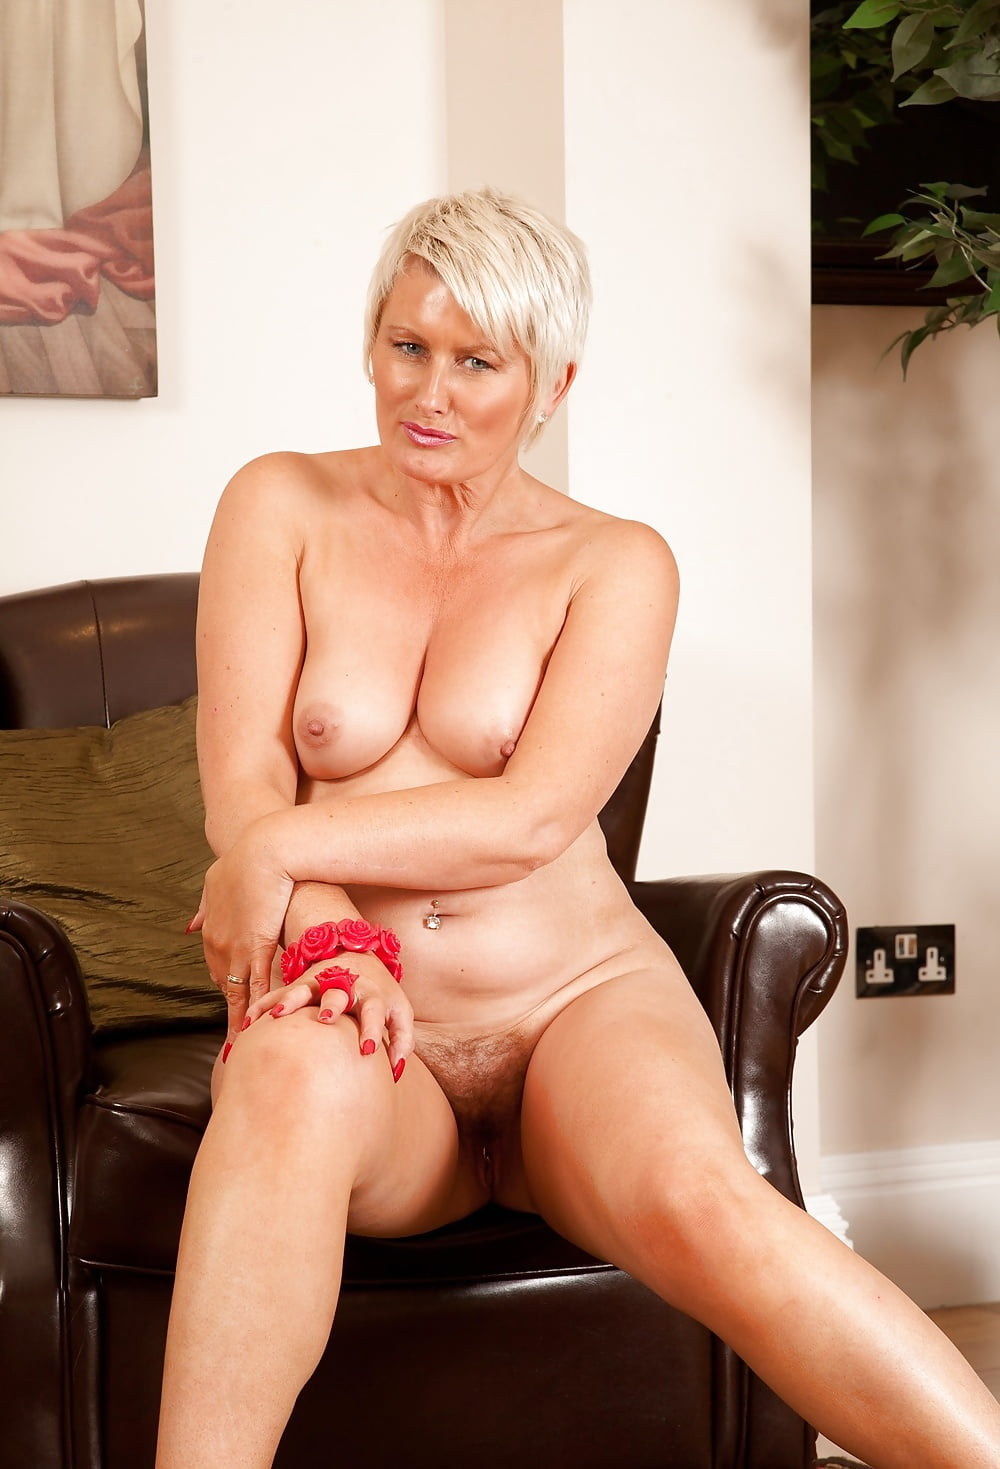 Английская порнозвезда салли тейлор